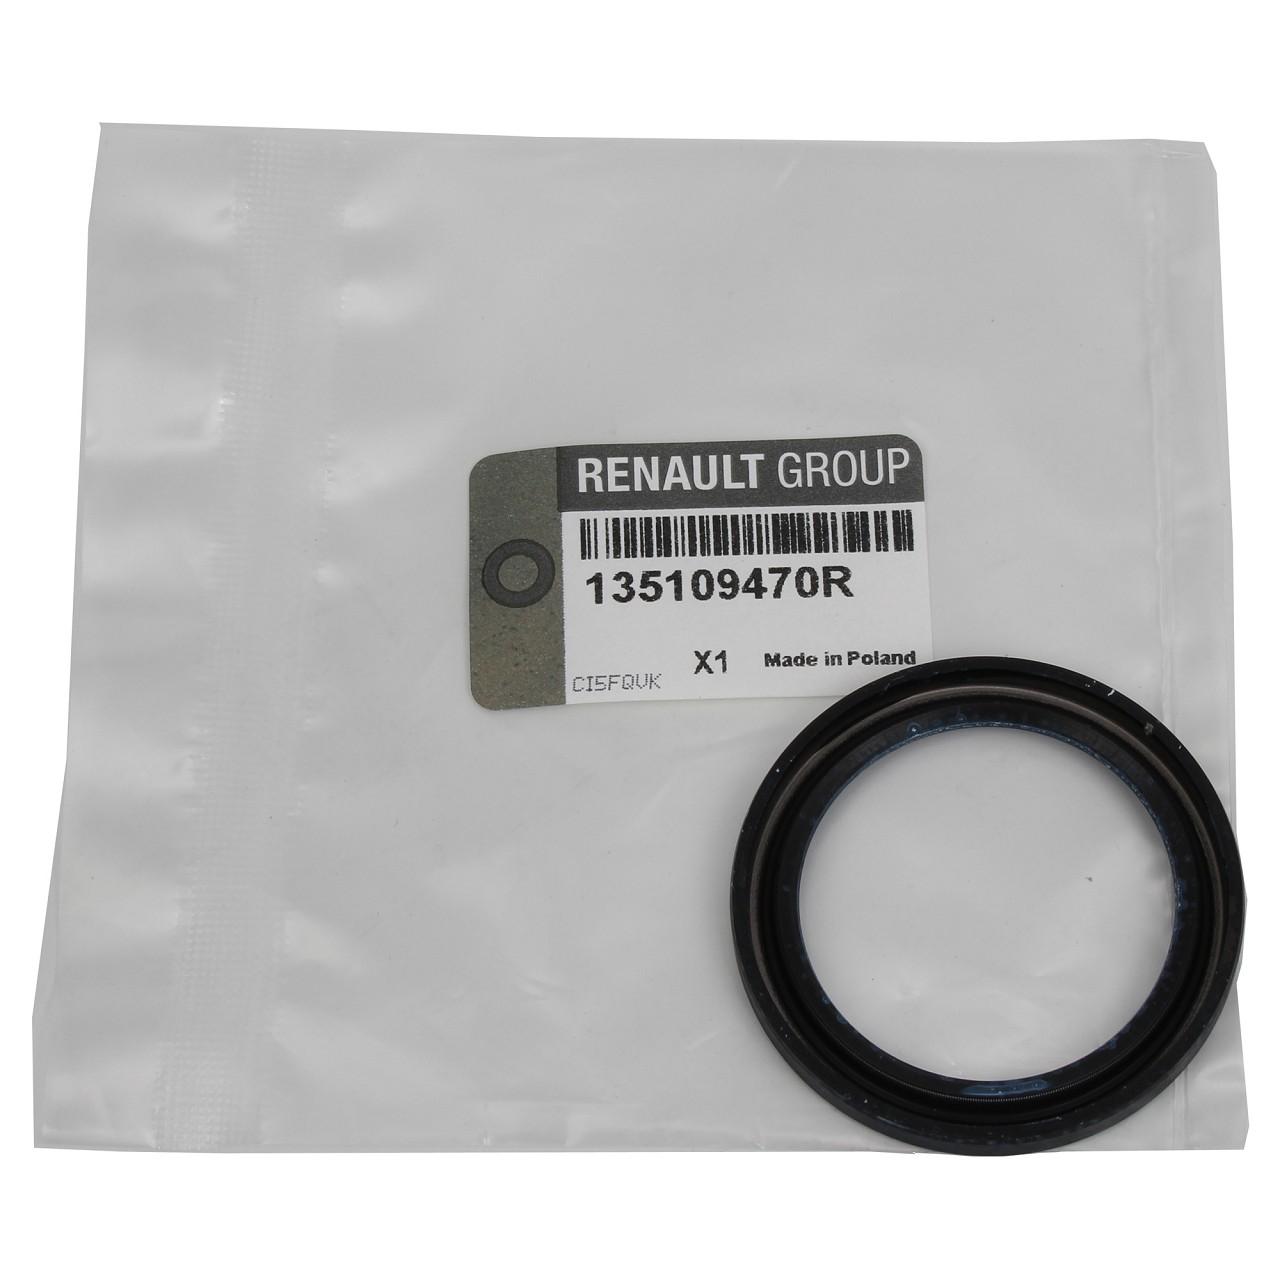 ORIGINAL Renault Wellendichtring Simmering Kurbelwelle 42x54x6 135109470R